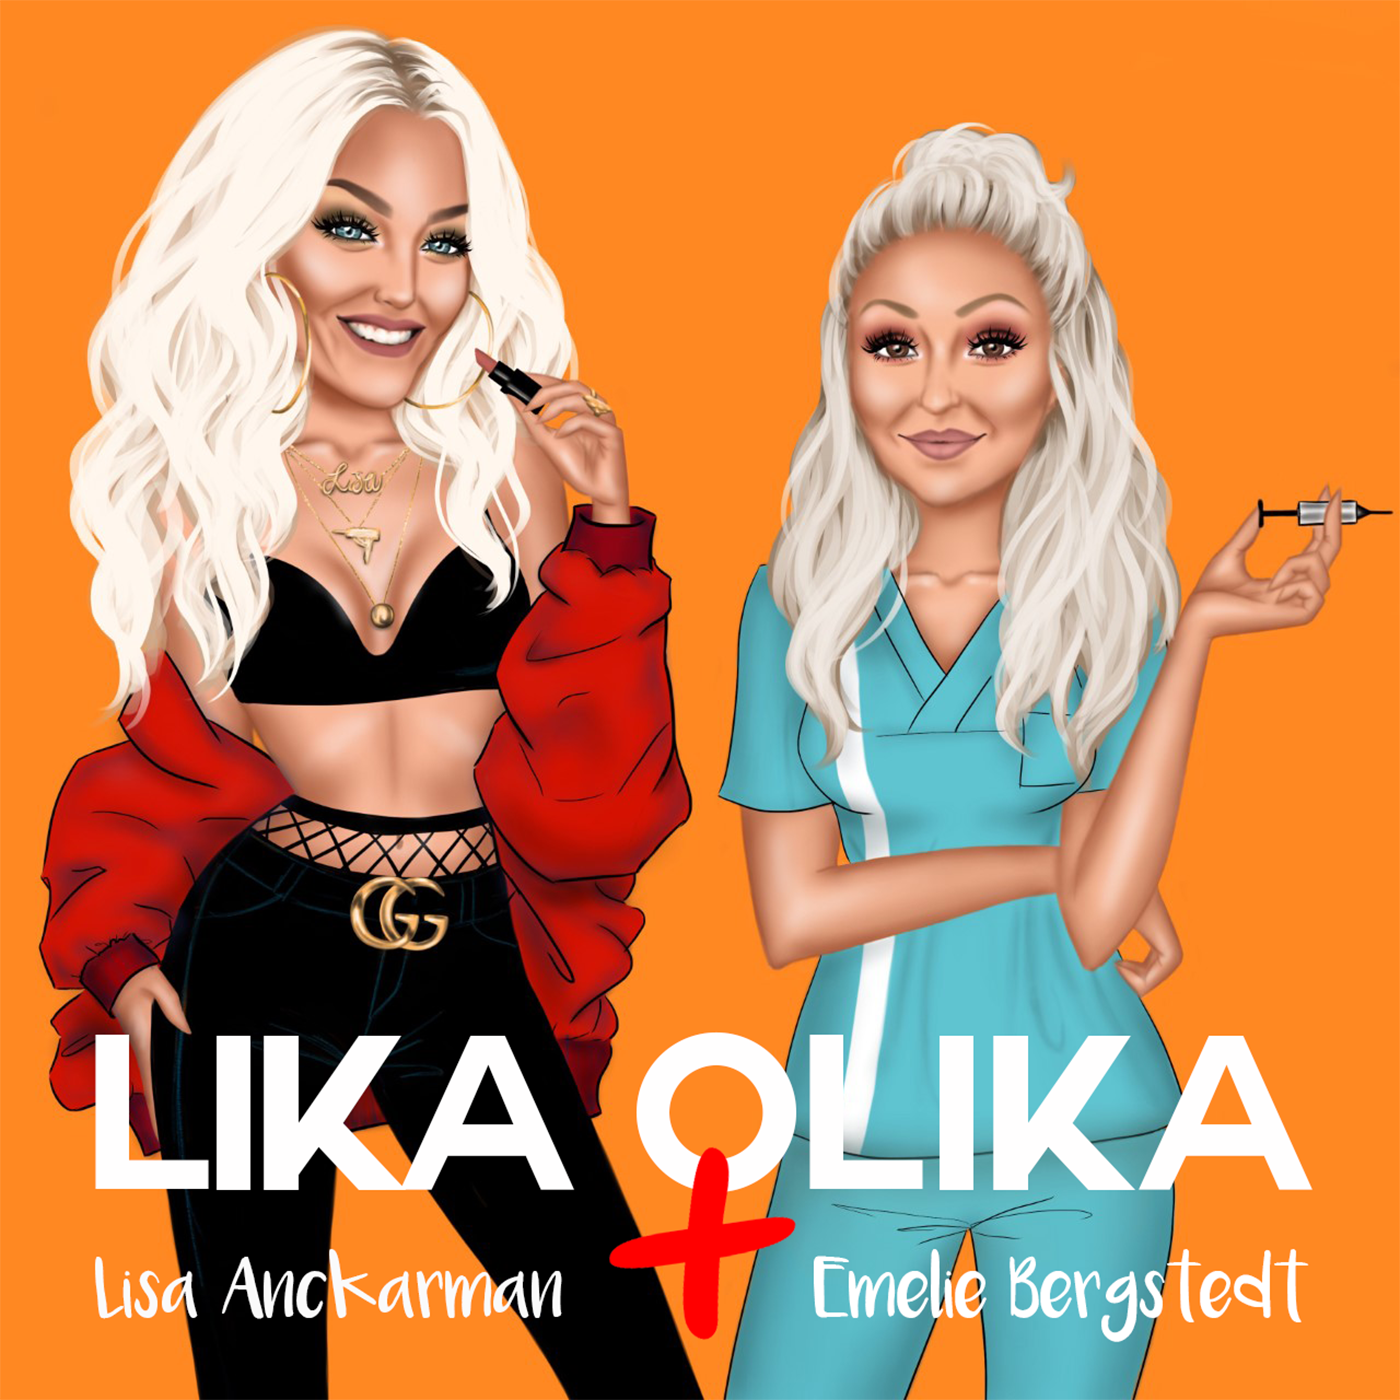 Lika Olika show art